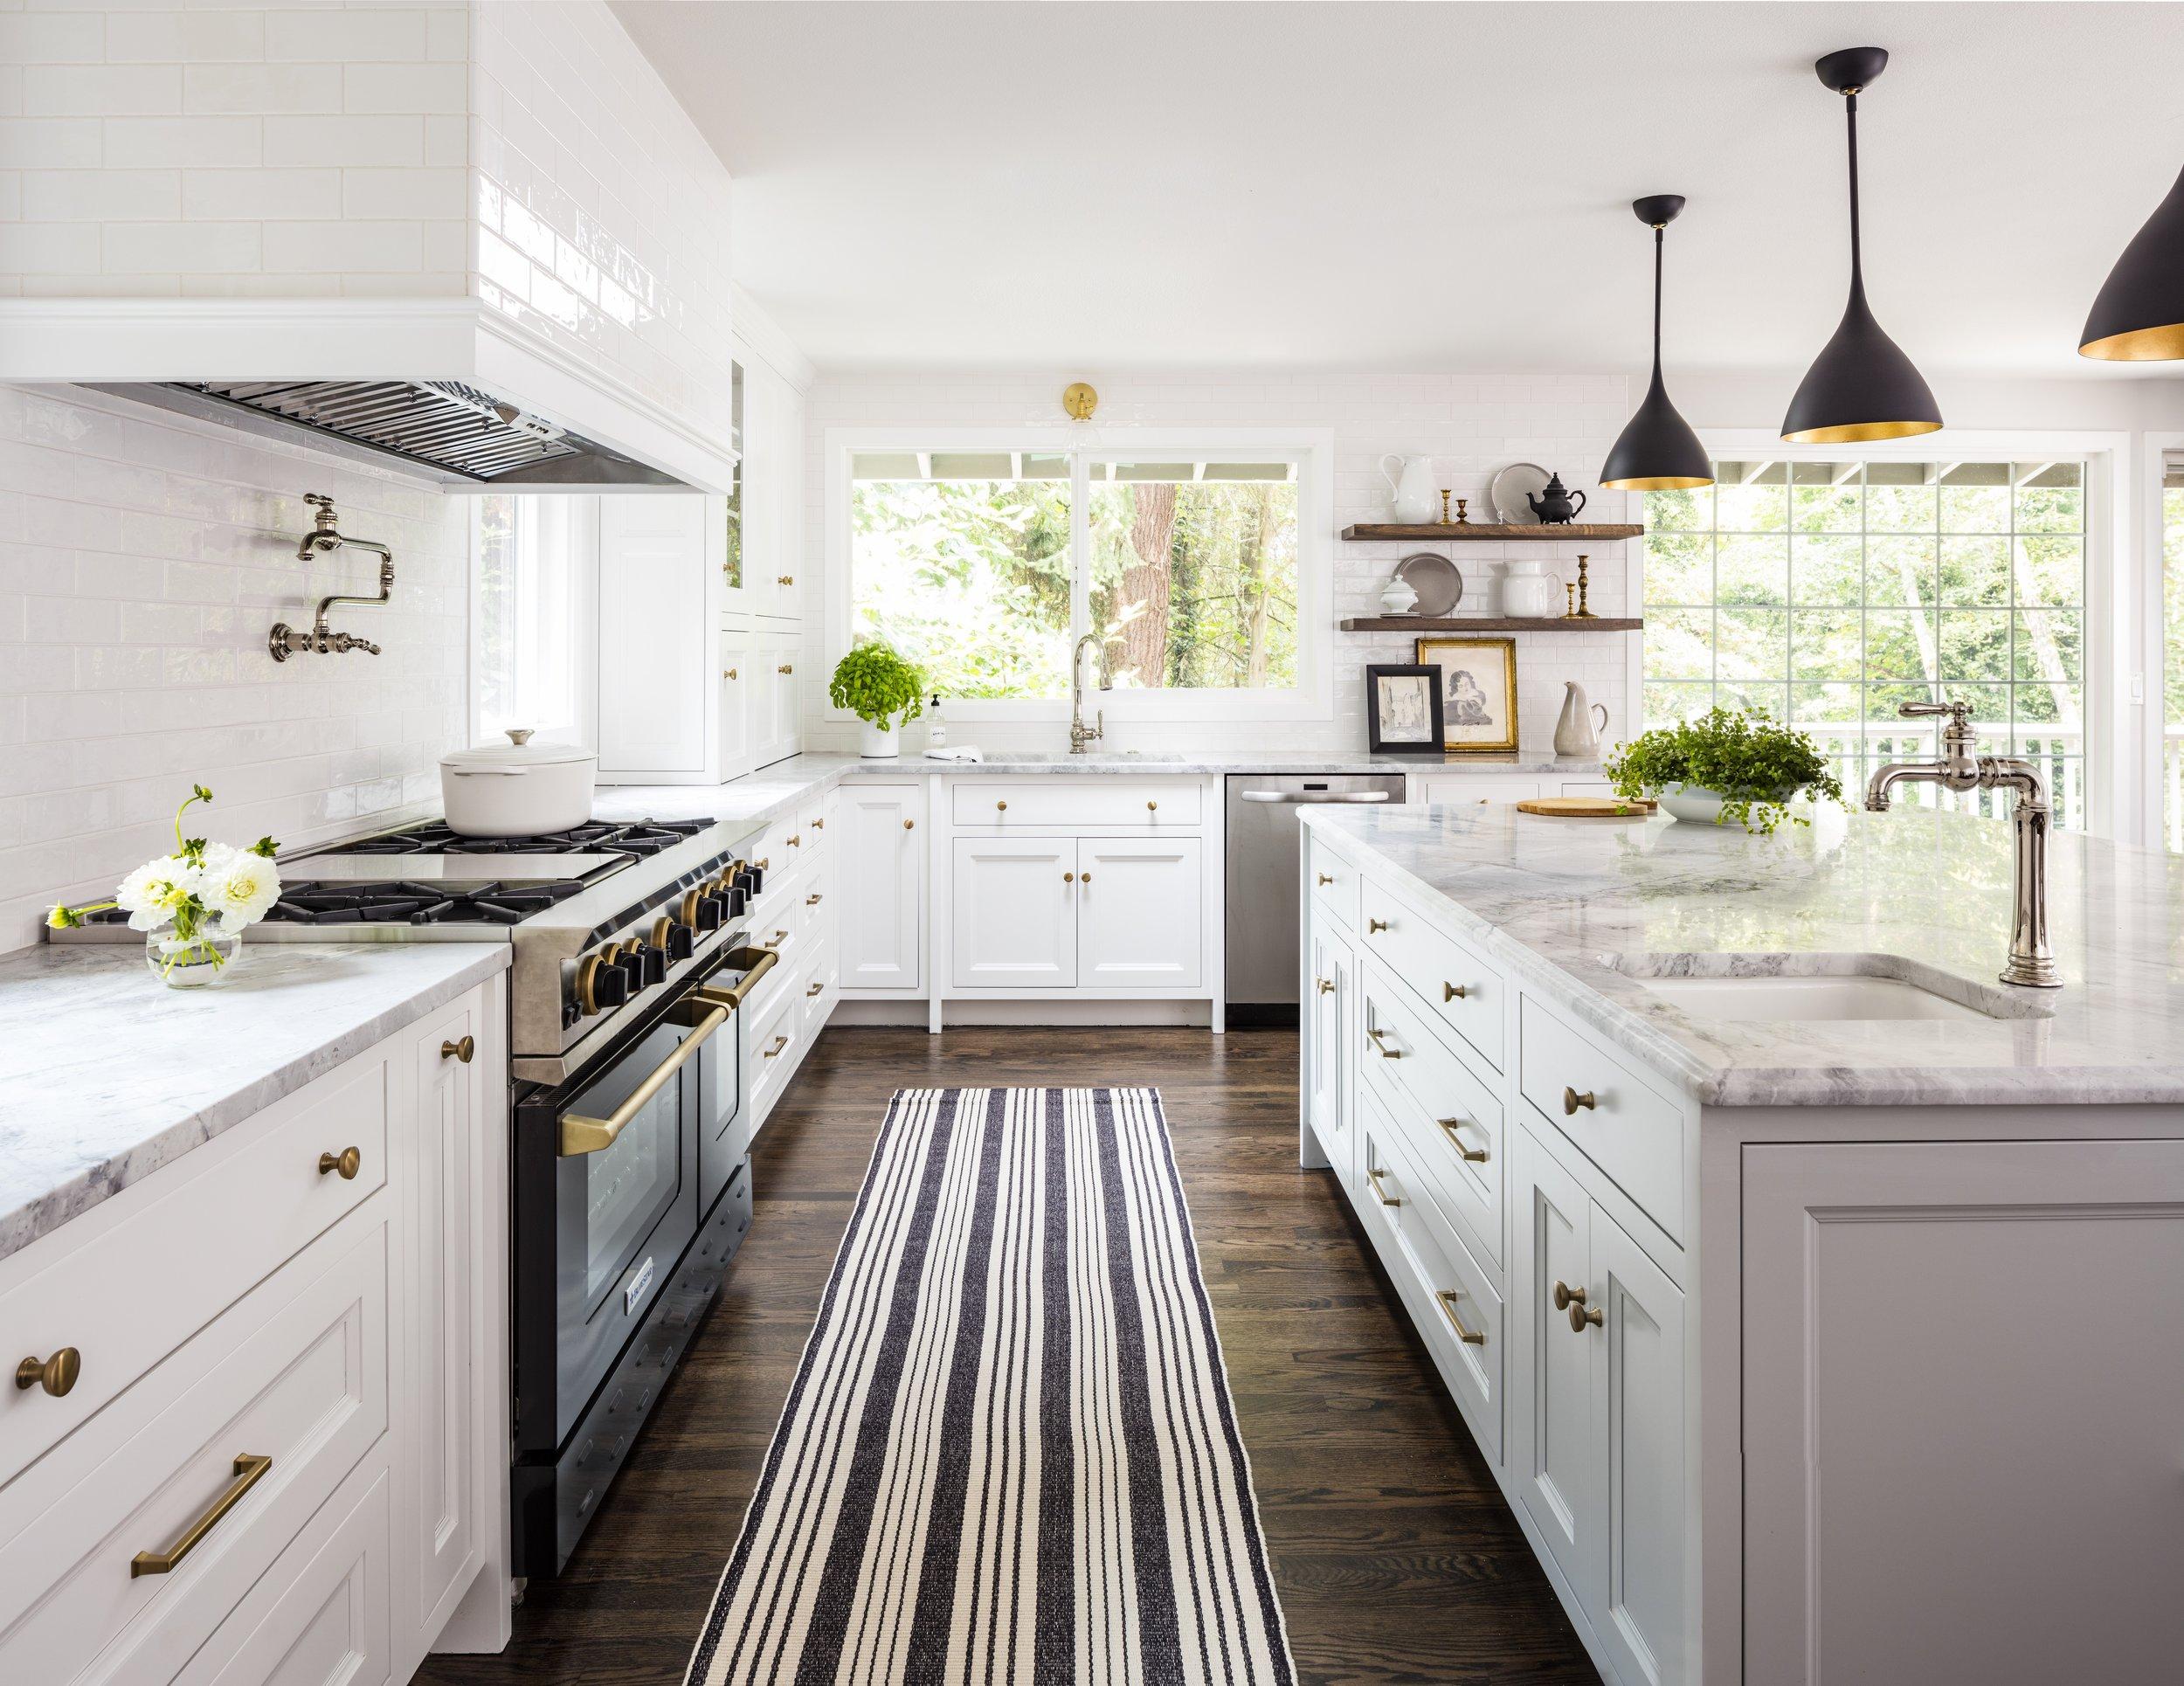 Trad+Mod Kitchen 2 copy.jpg